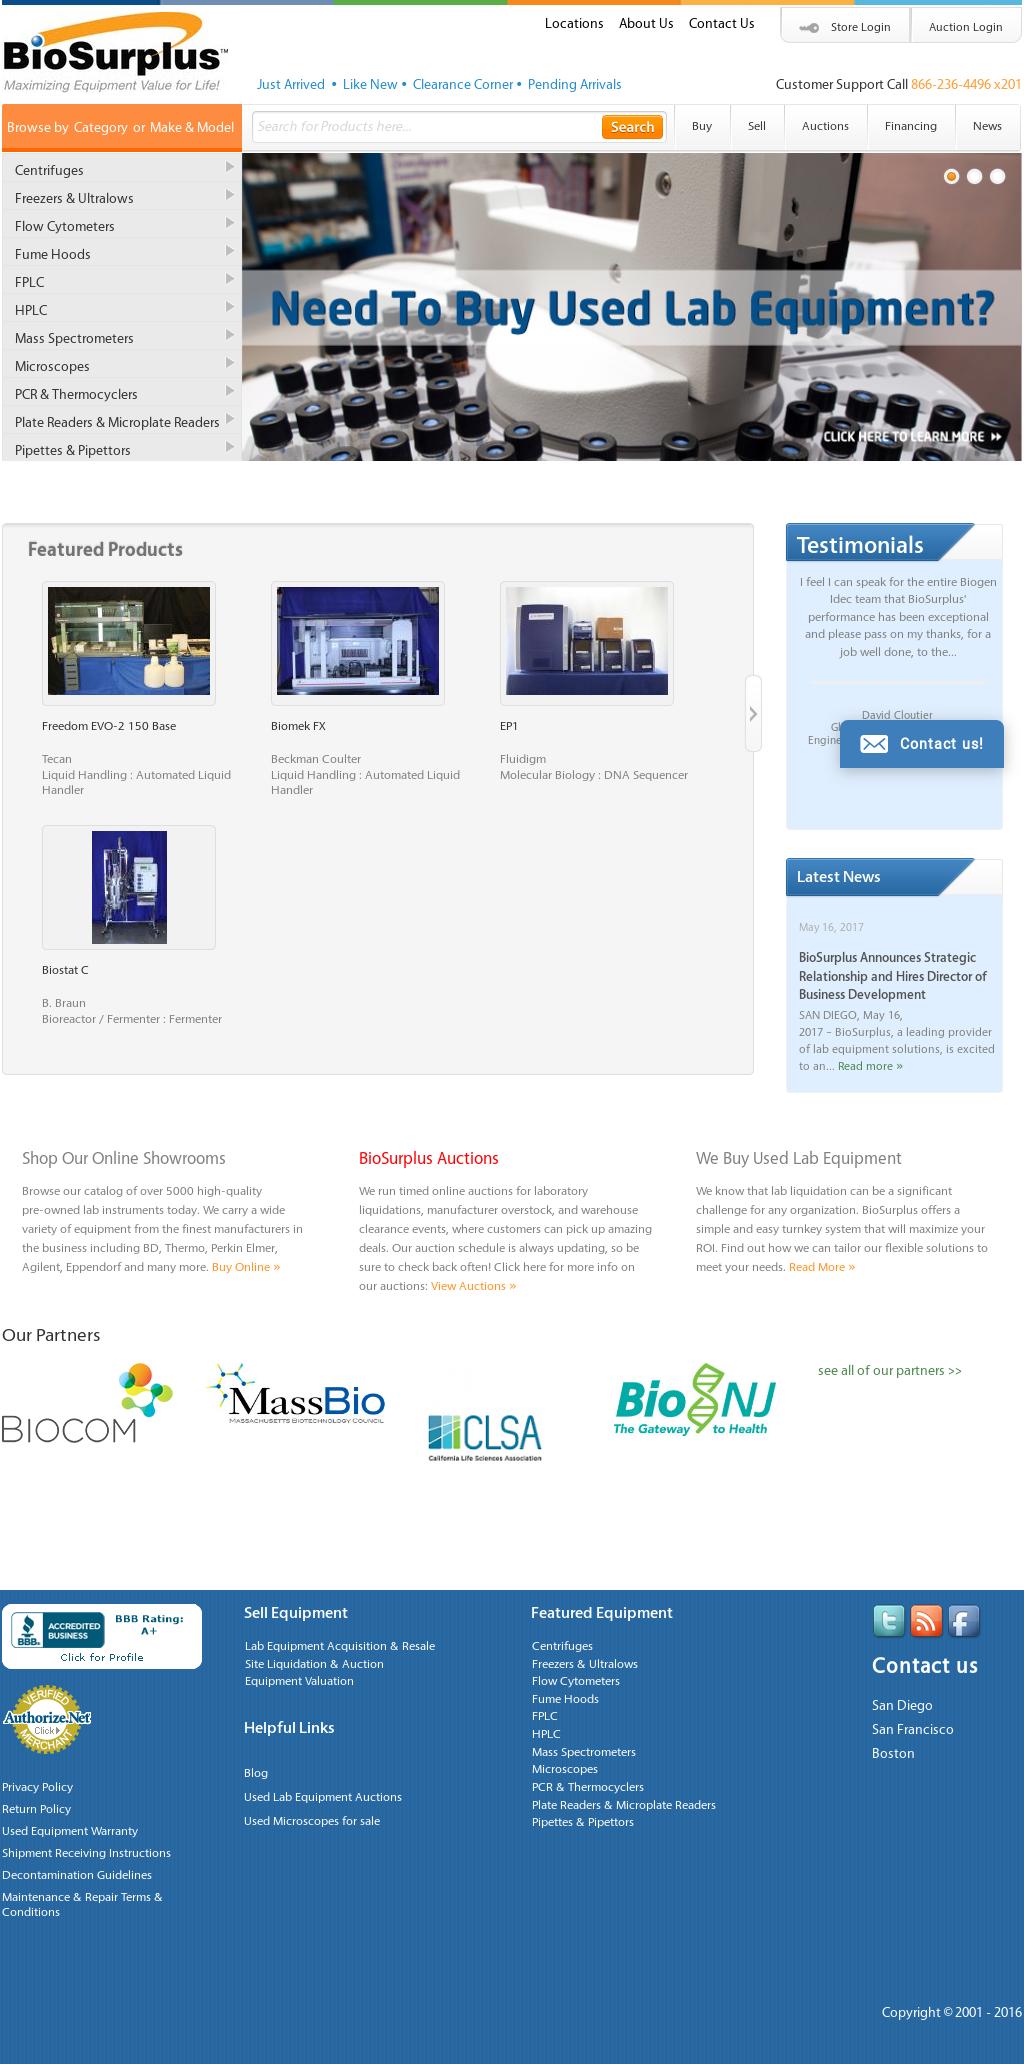 BioSurplus Competitors, Revenue and Employees - Owler Company Profile